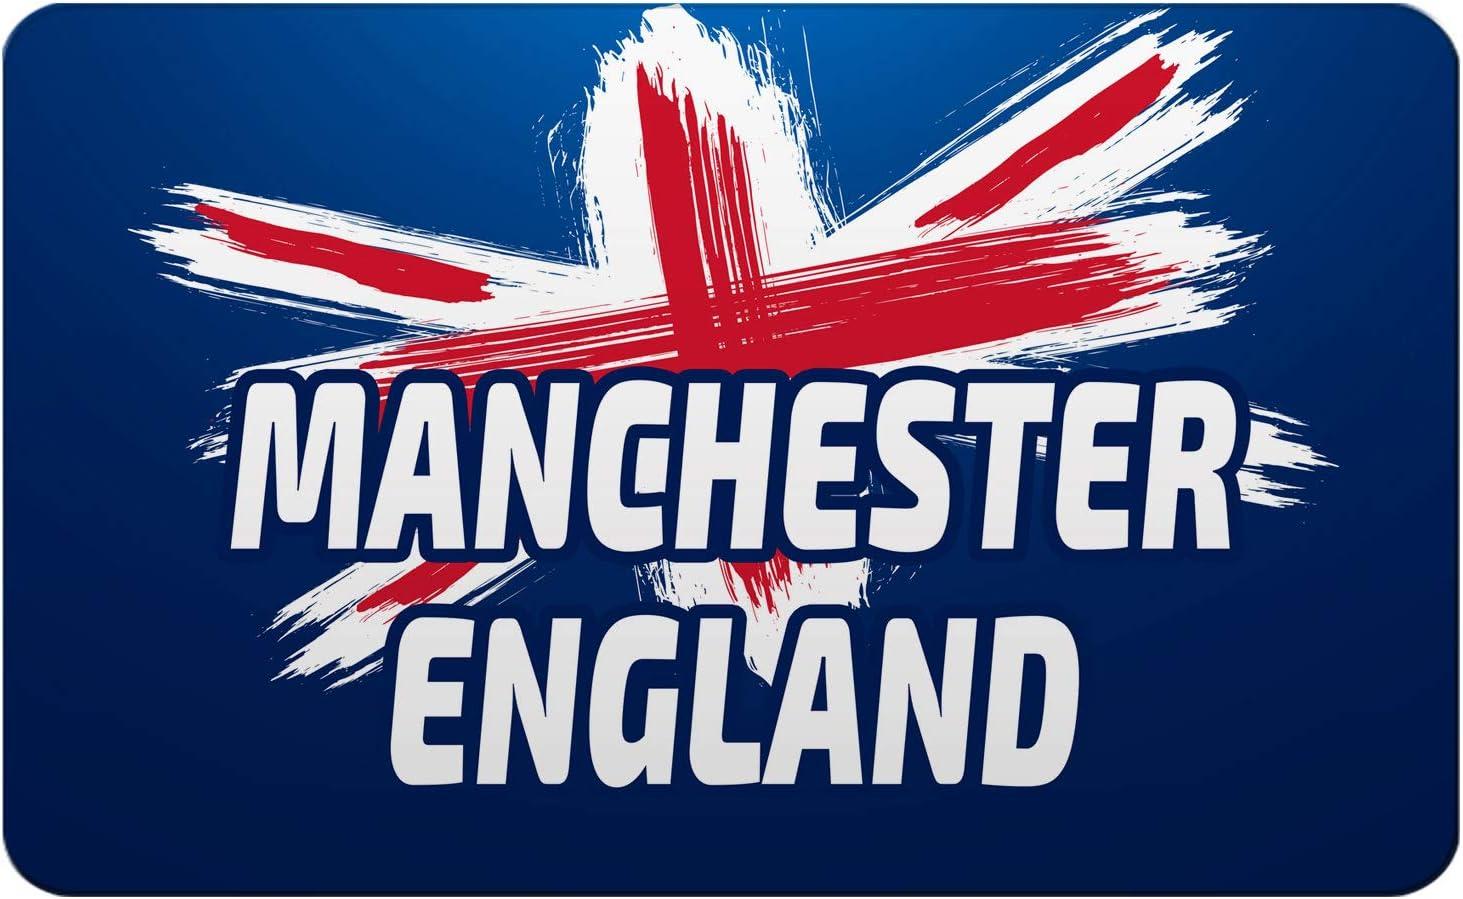 Makoroni - MANCHESTER ENGLAND British England UK Des#2 Refrigerator Wall Magnet 2.75x3.5 inc